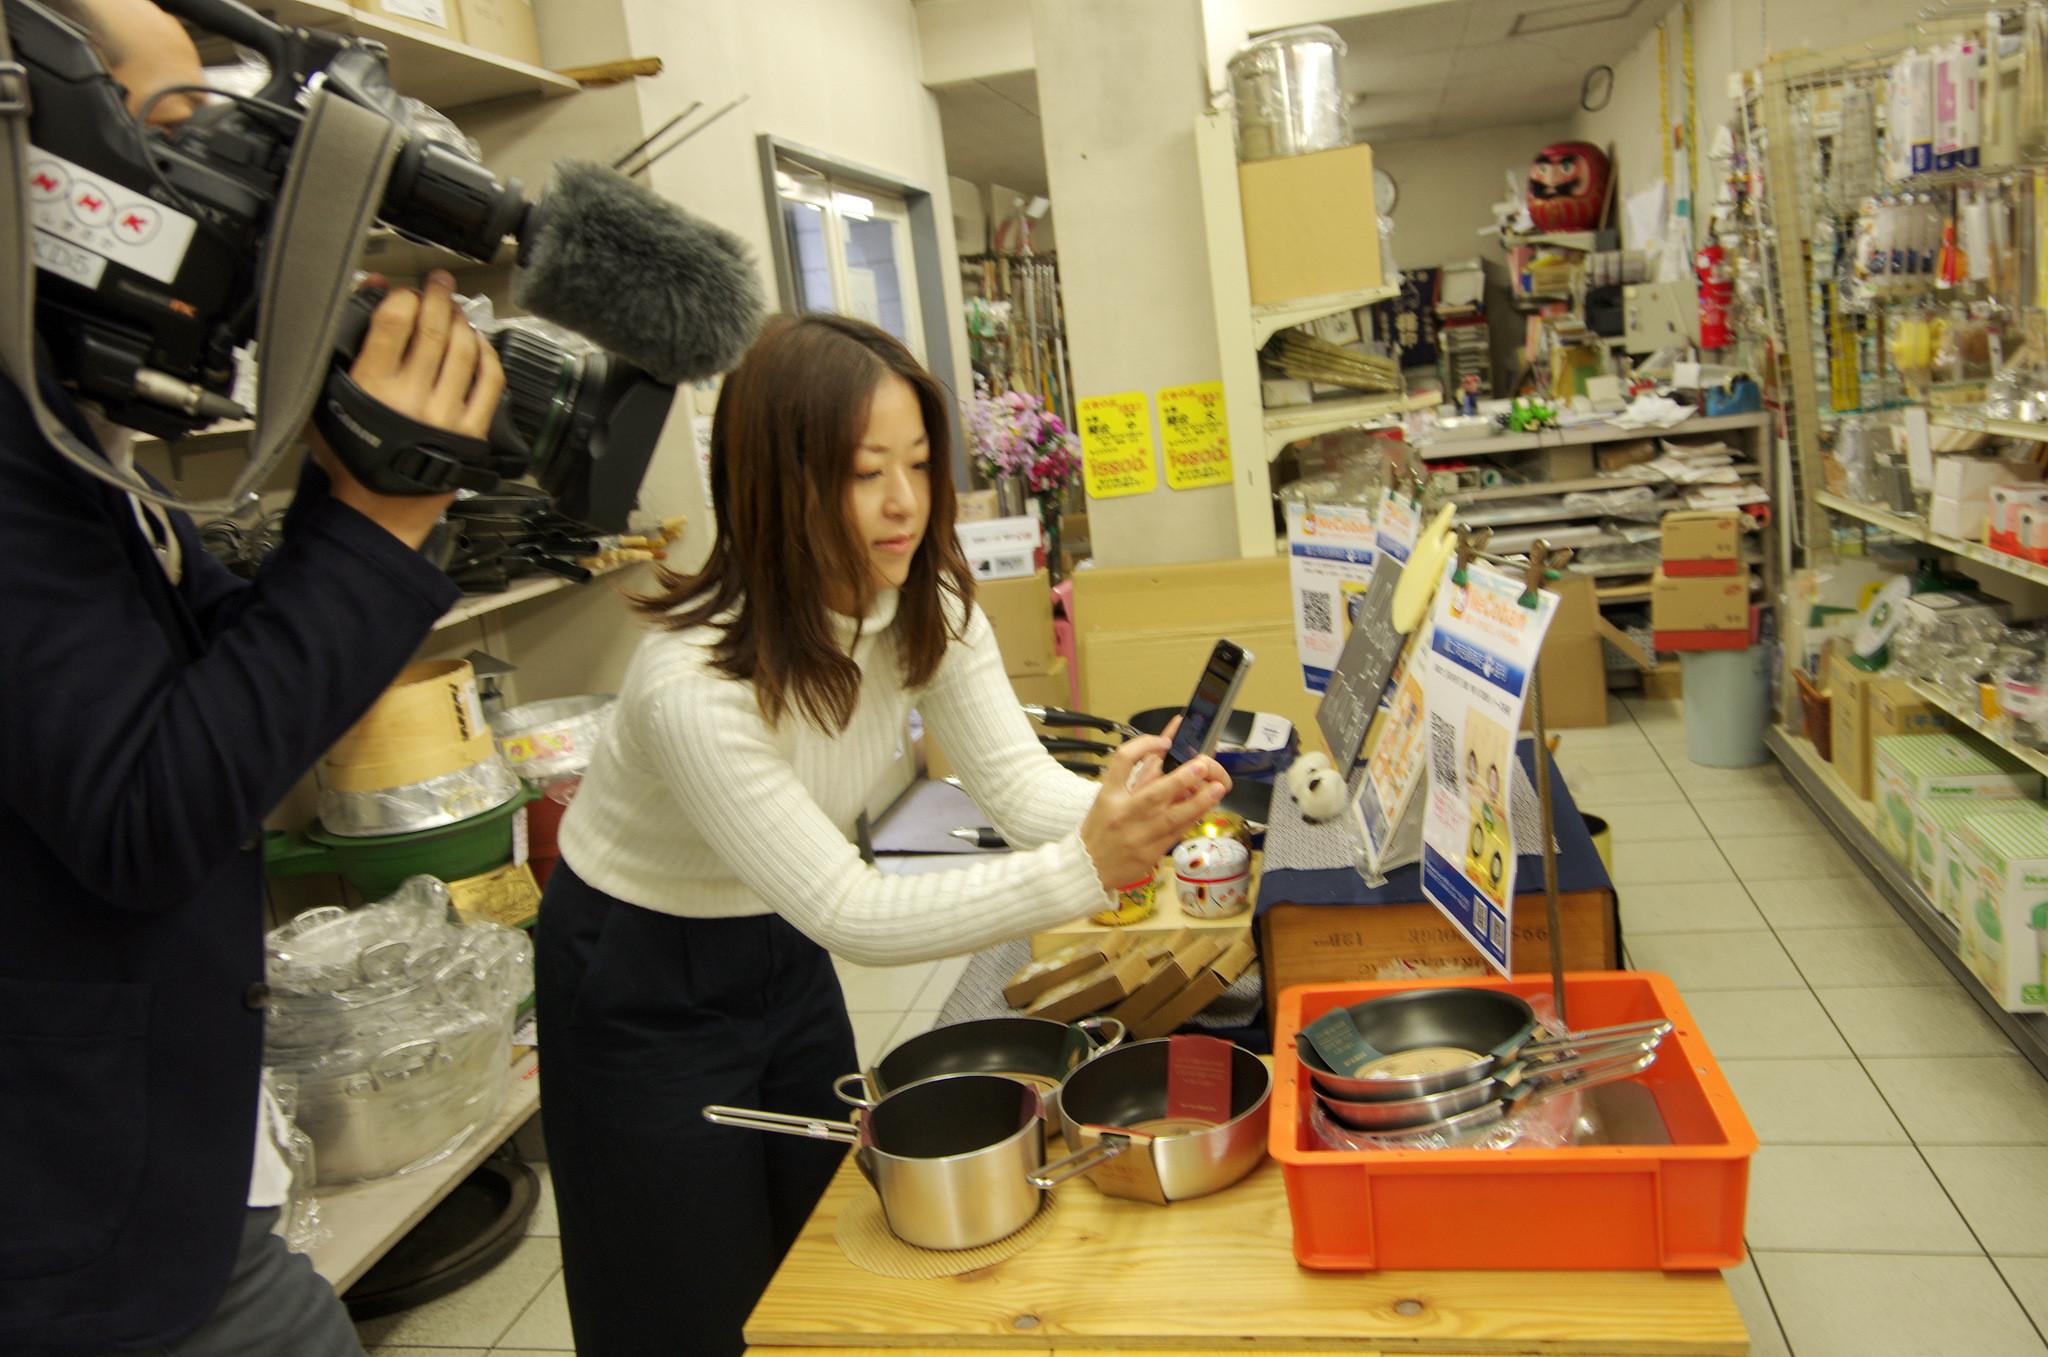 NHKたっぷり静岡necoban